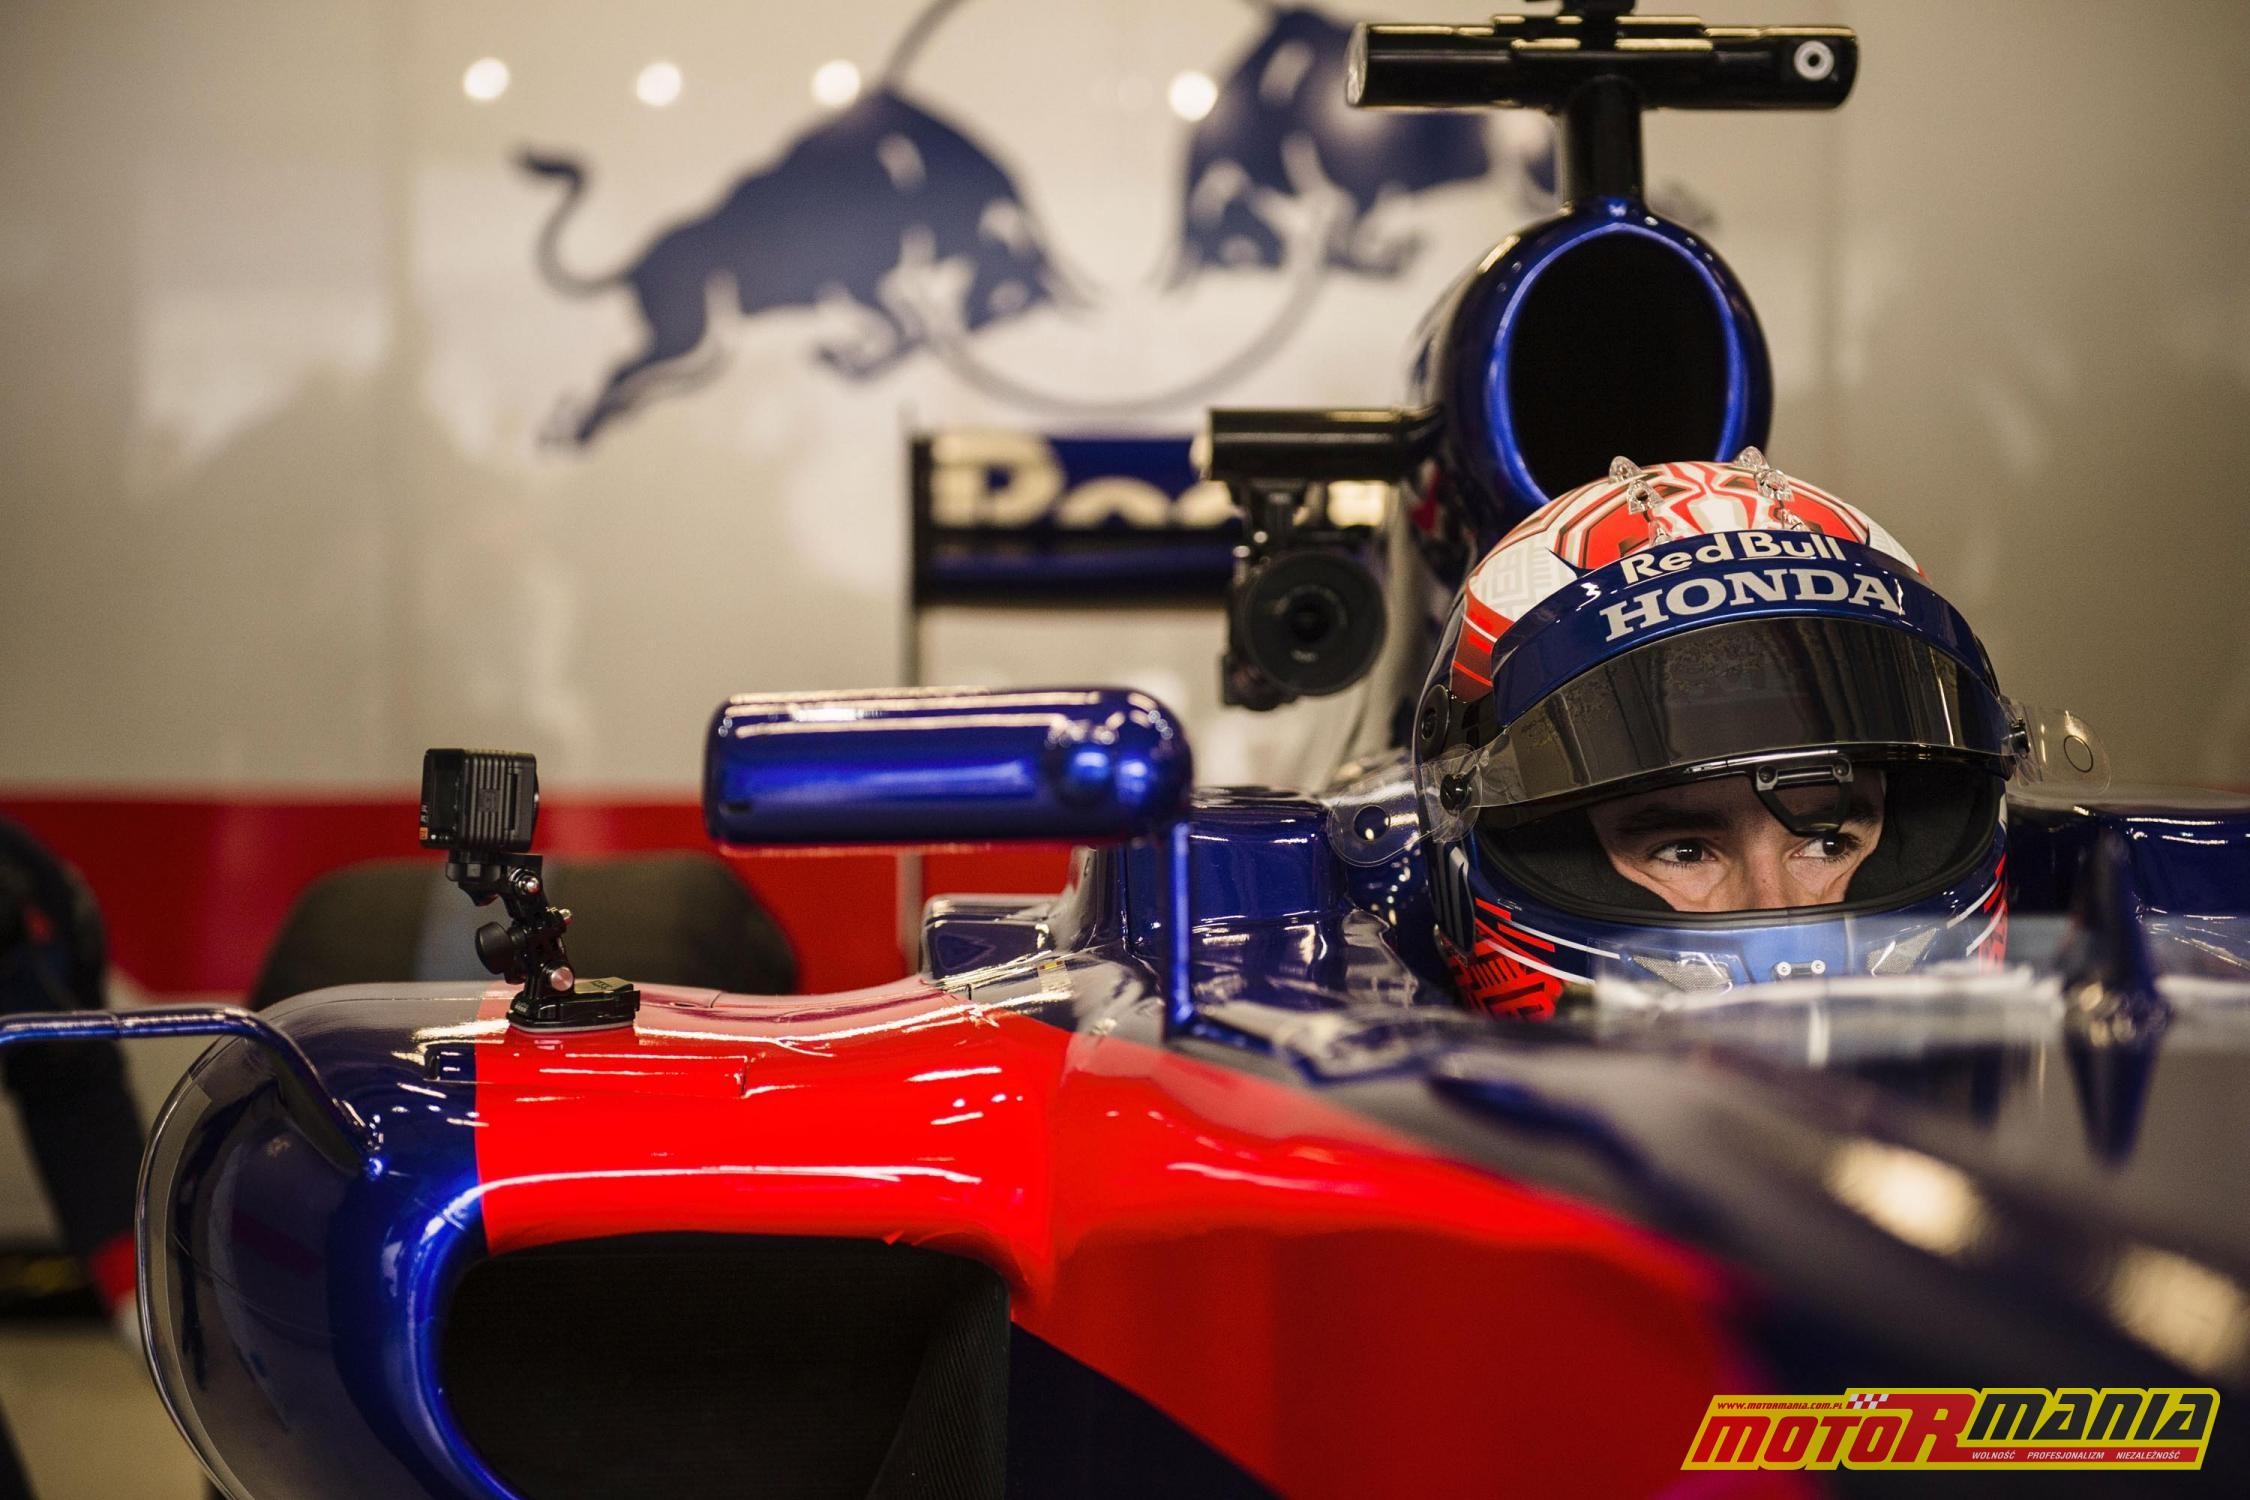 Marquez F1 toro rosso 2018 red bull ring (2)